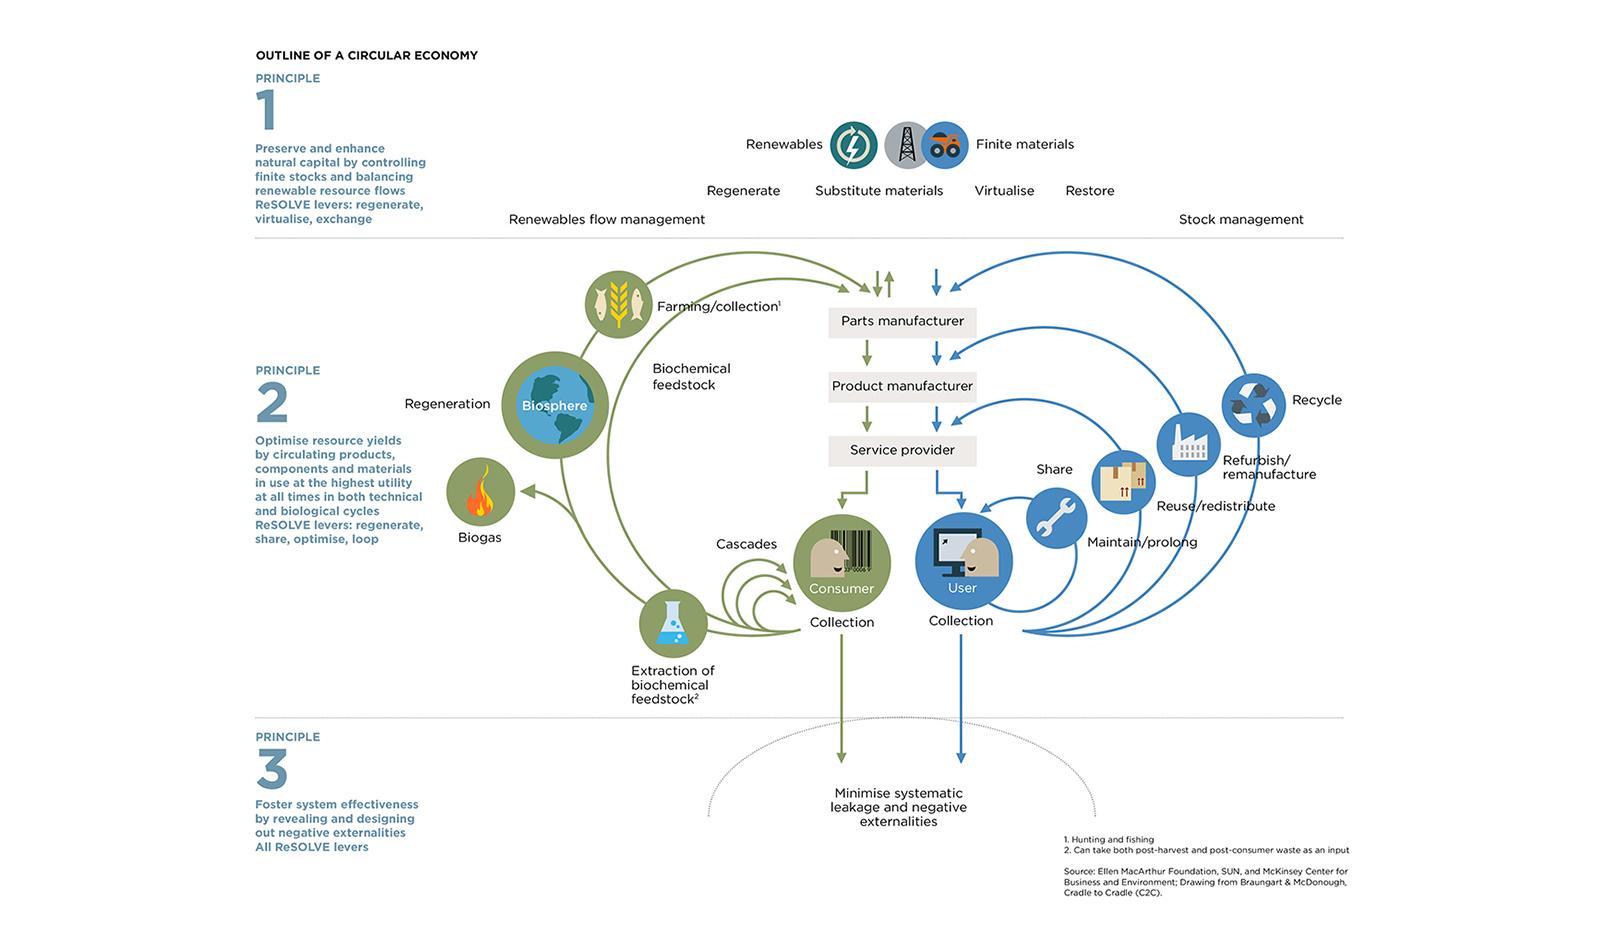 Circular Economy System Diagram  by The Ellen MacArthur Foundation